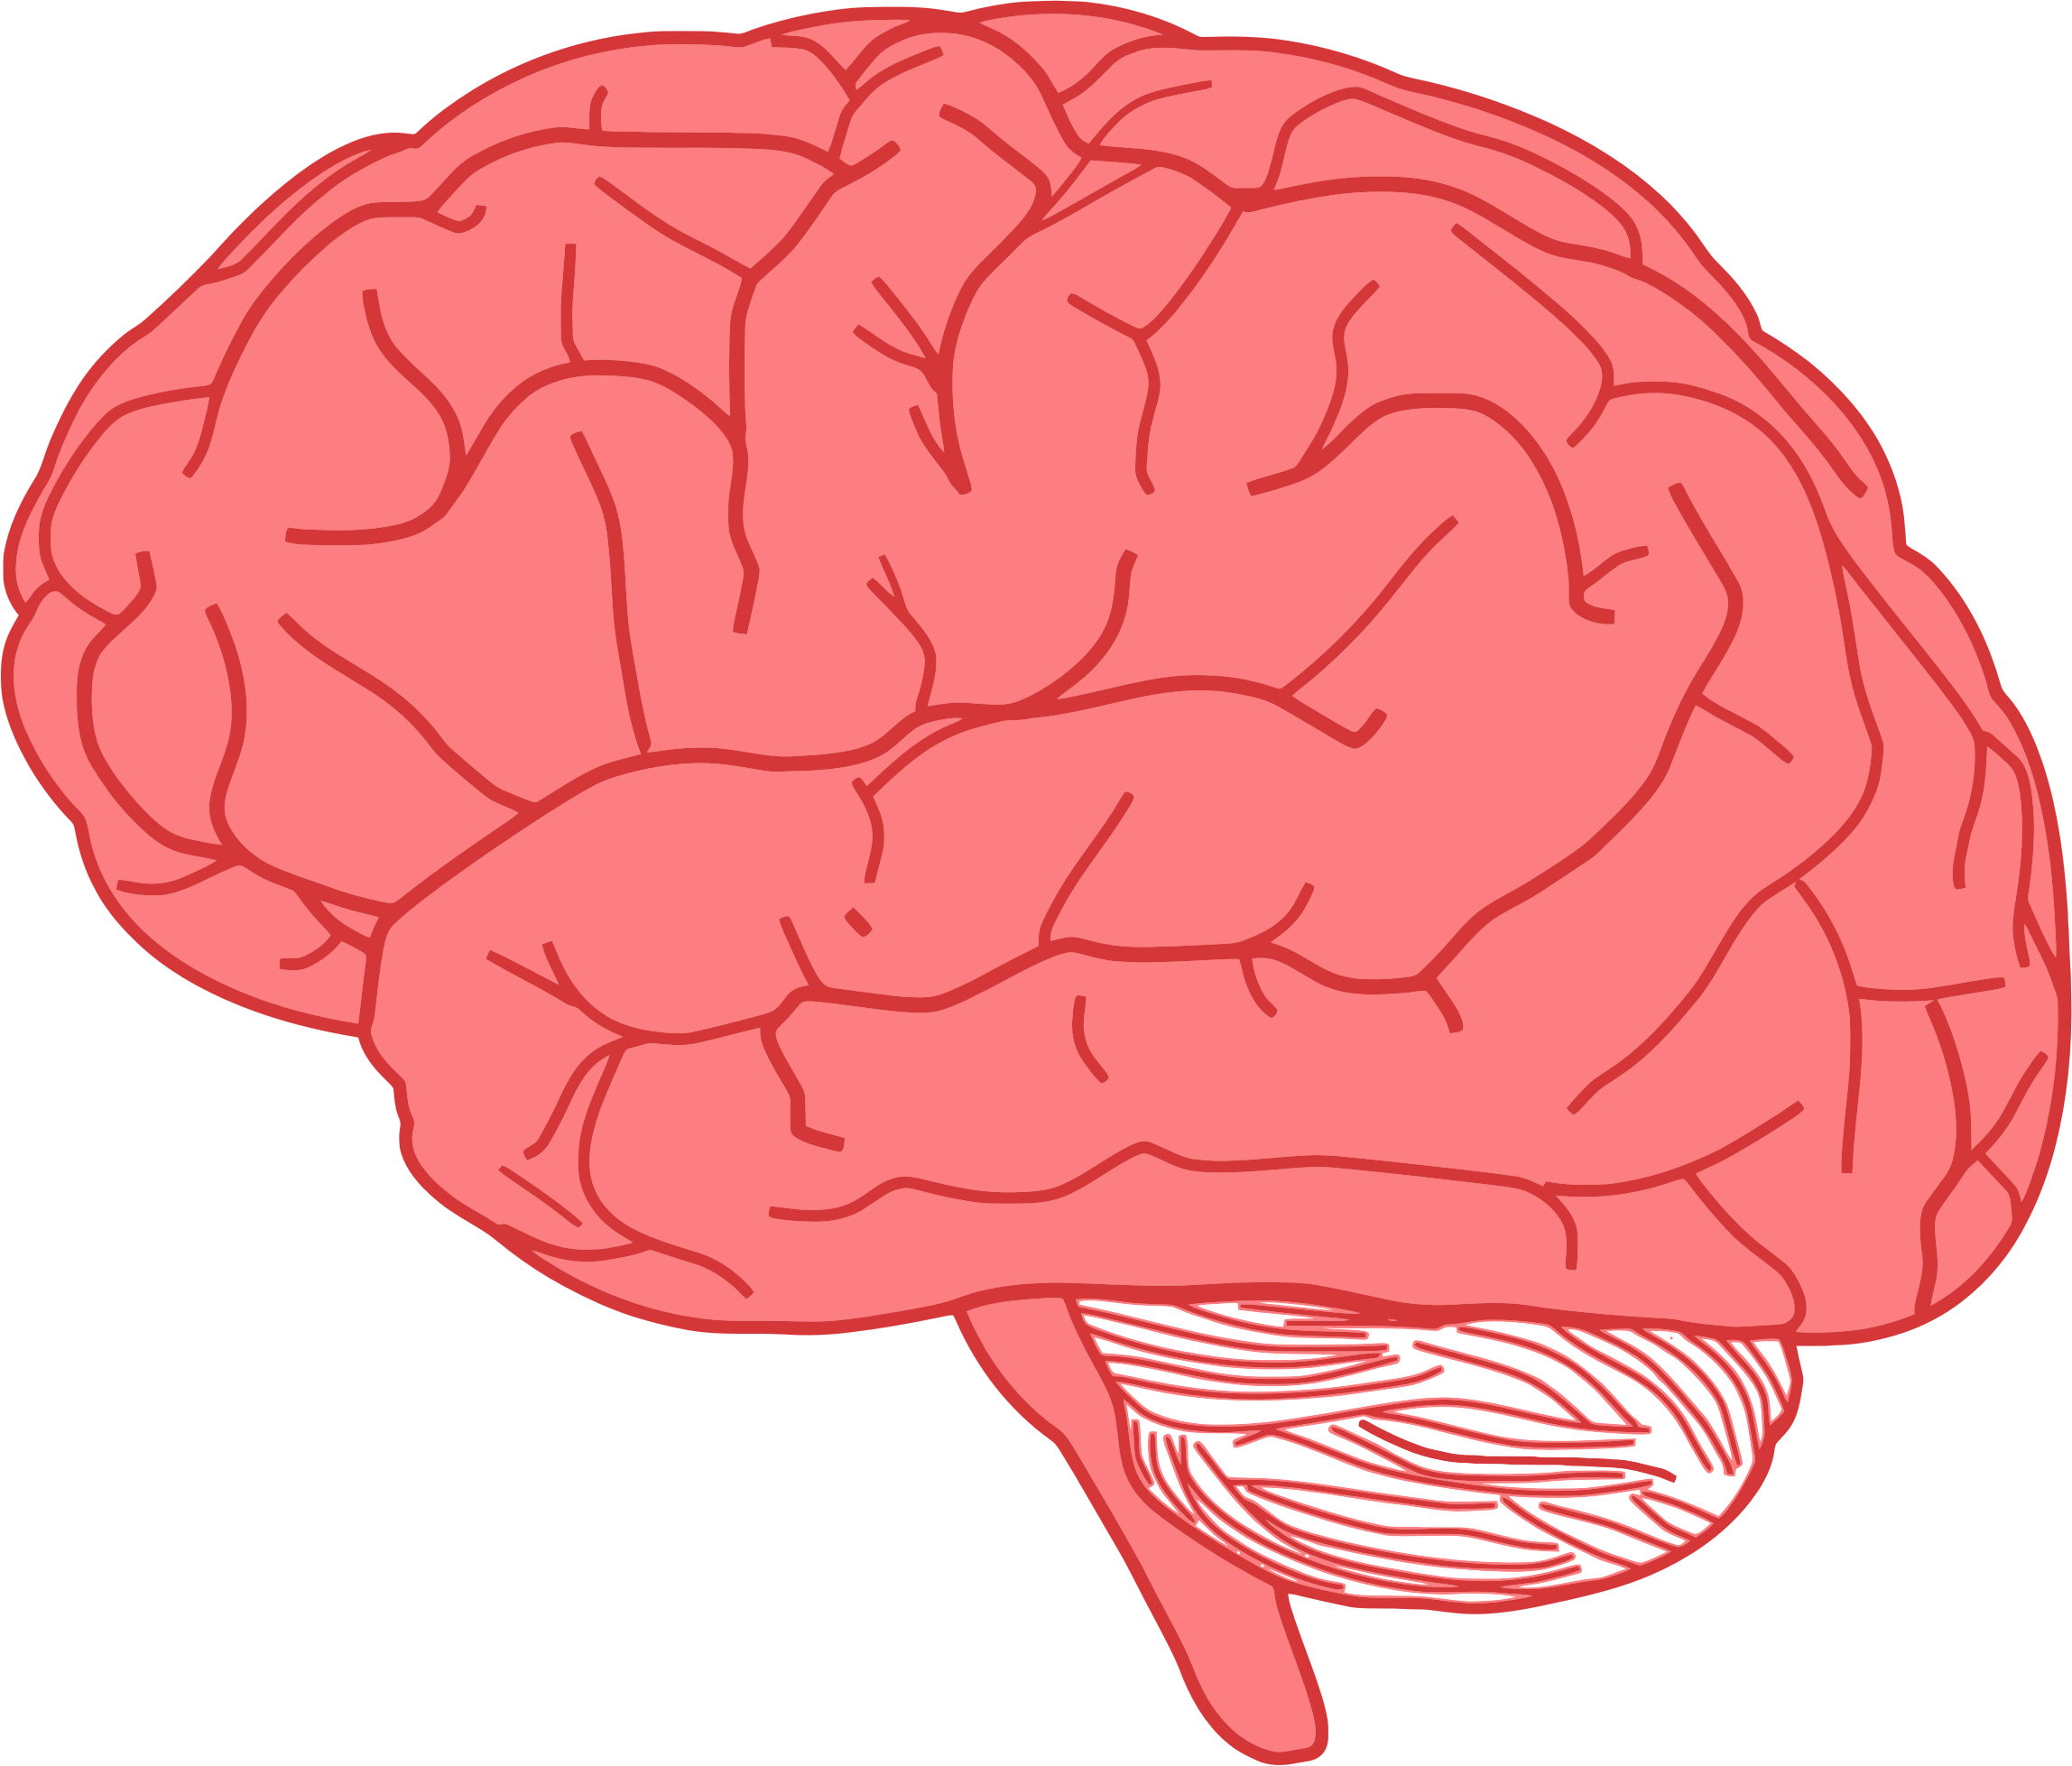 Clipart brain mind. Profile optimized big image